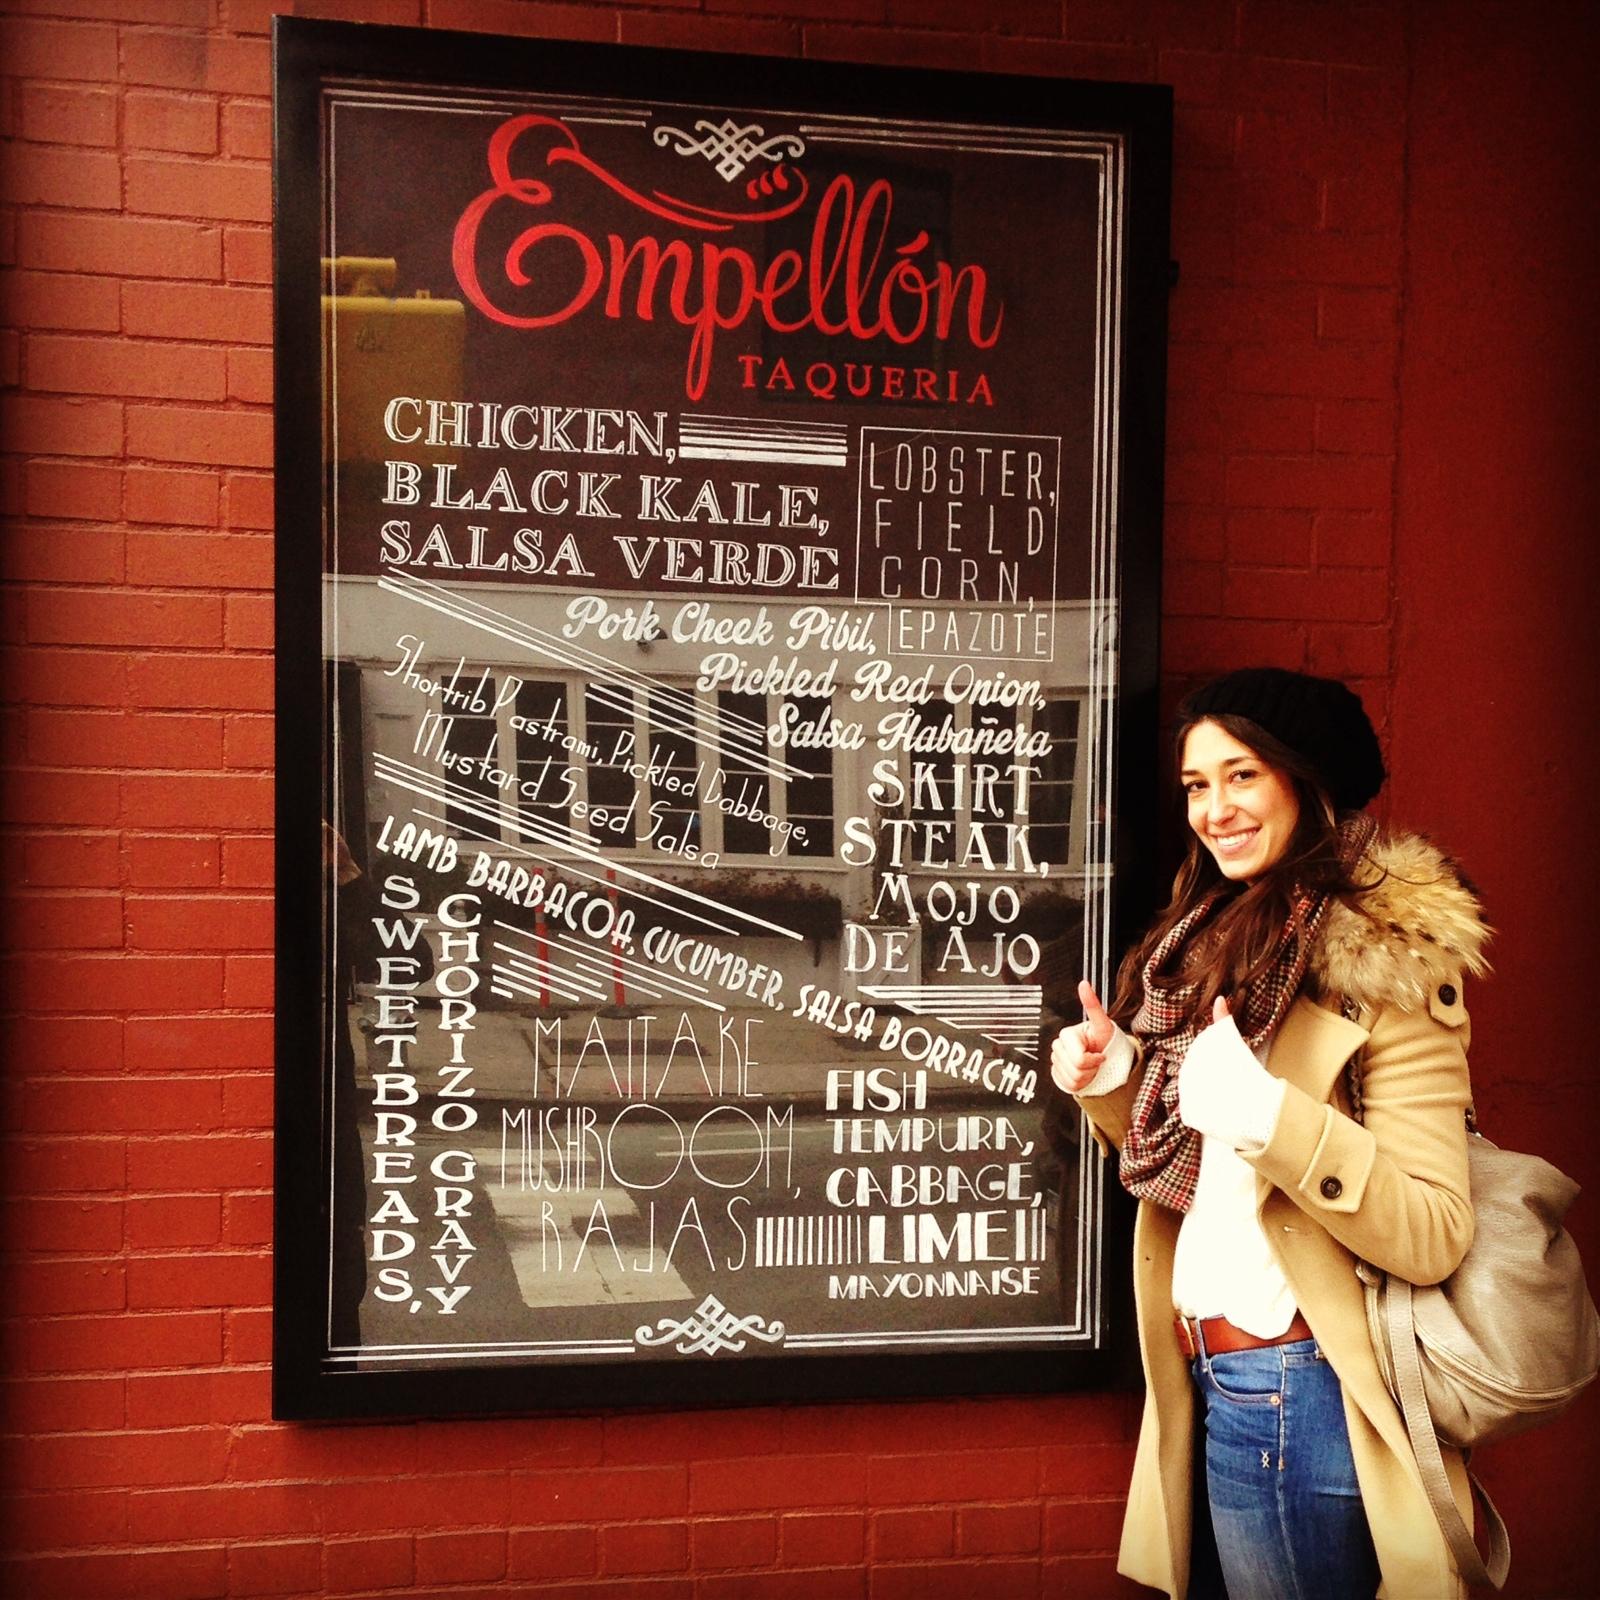 empellon-menu-chalkart.JPG